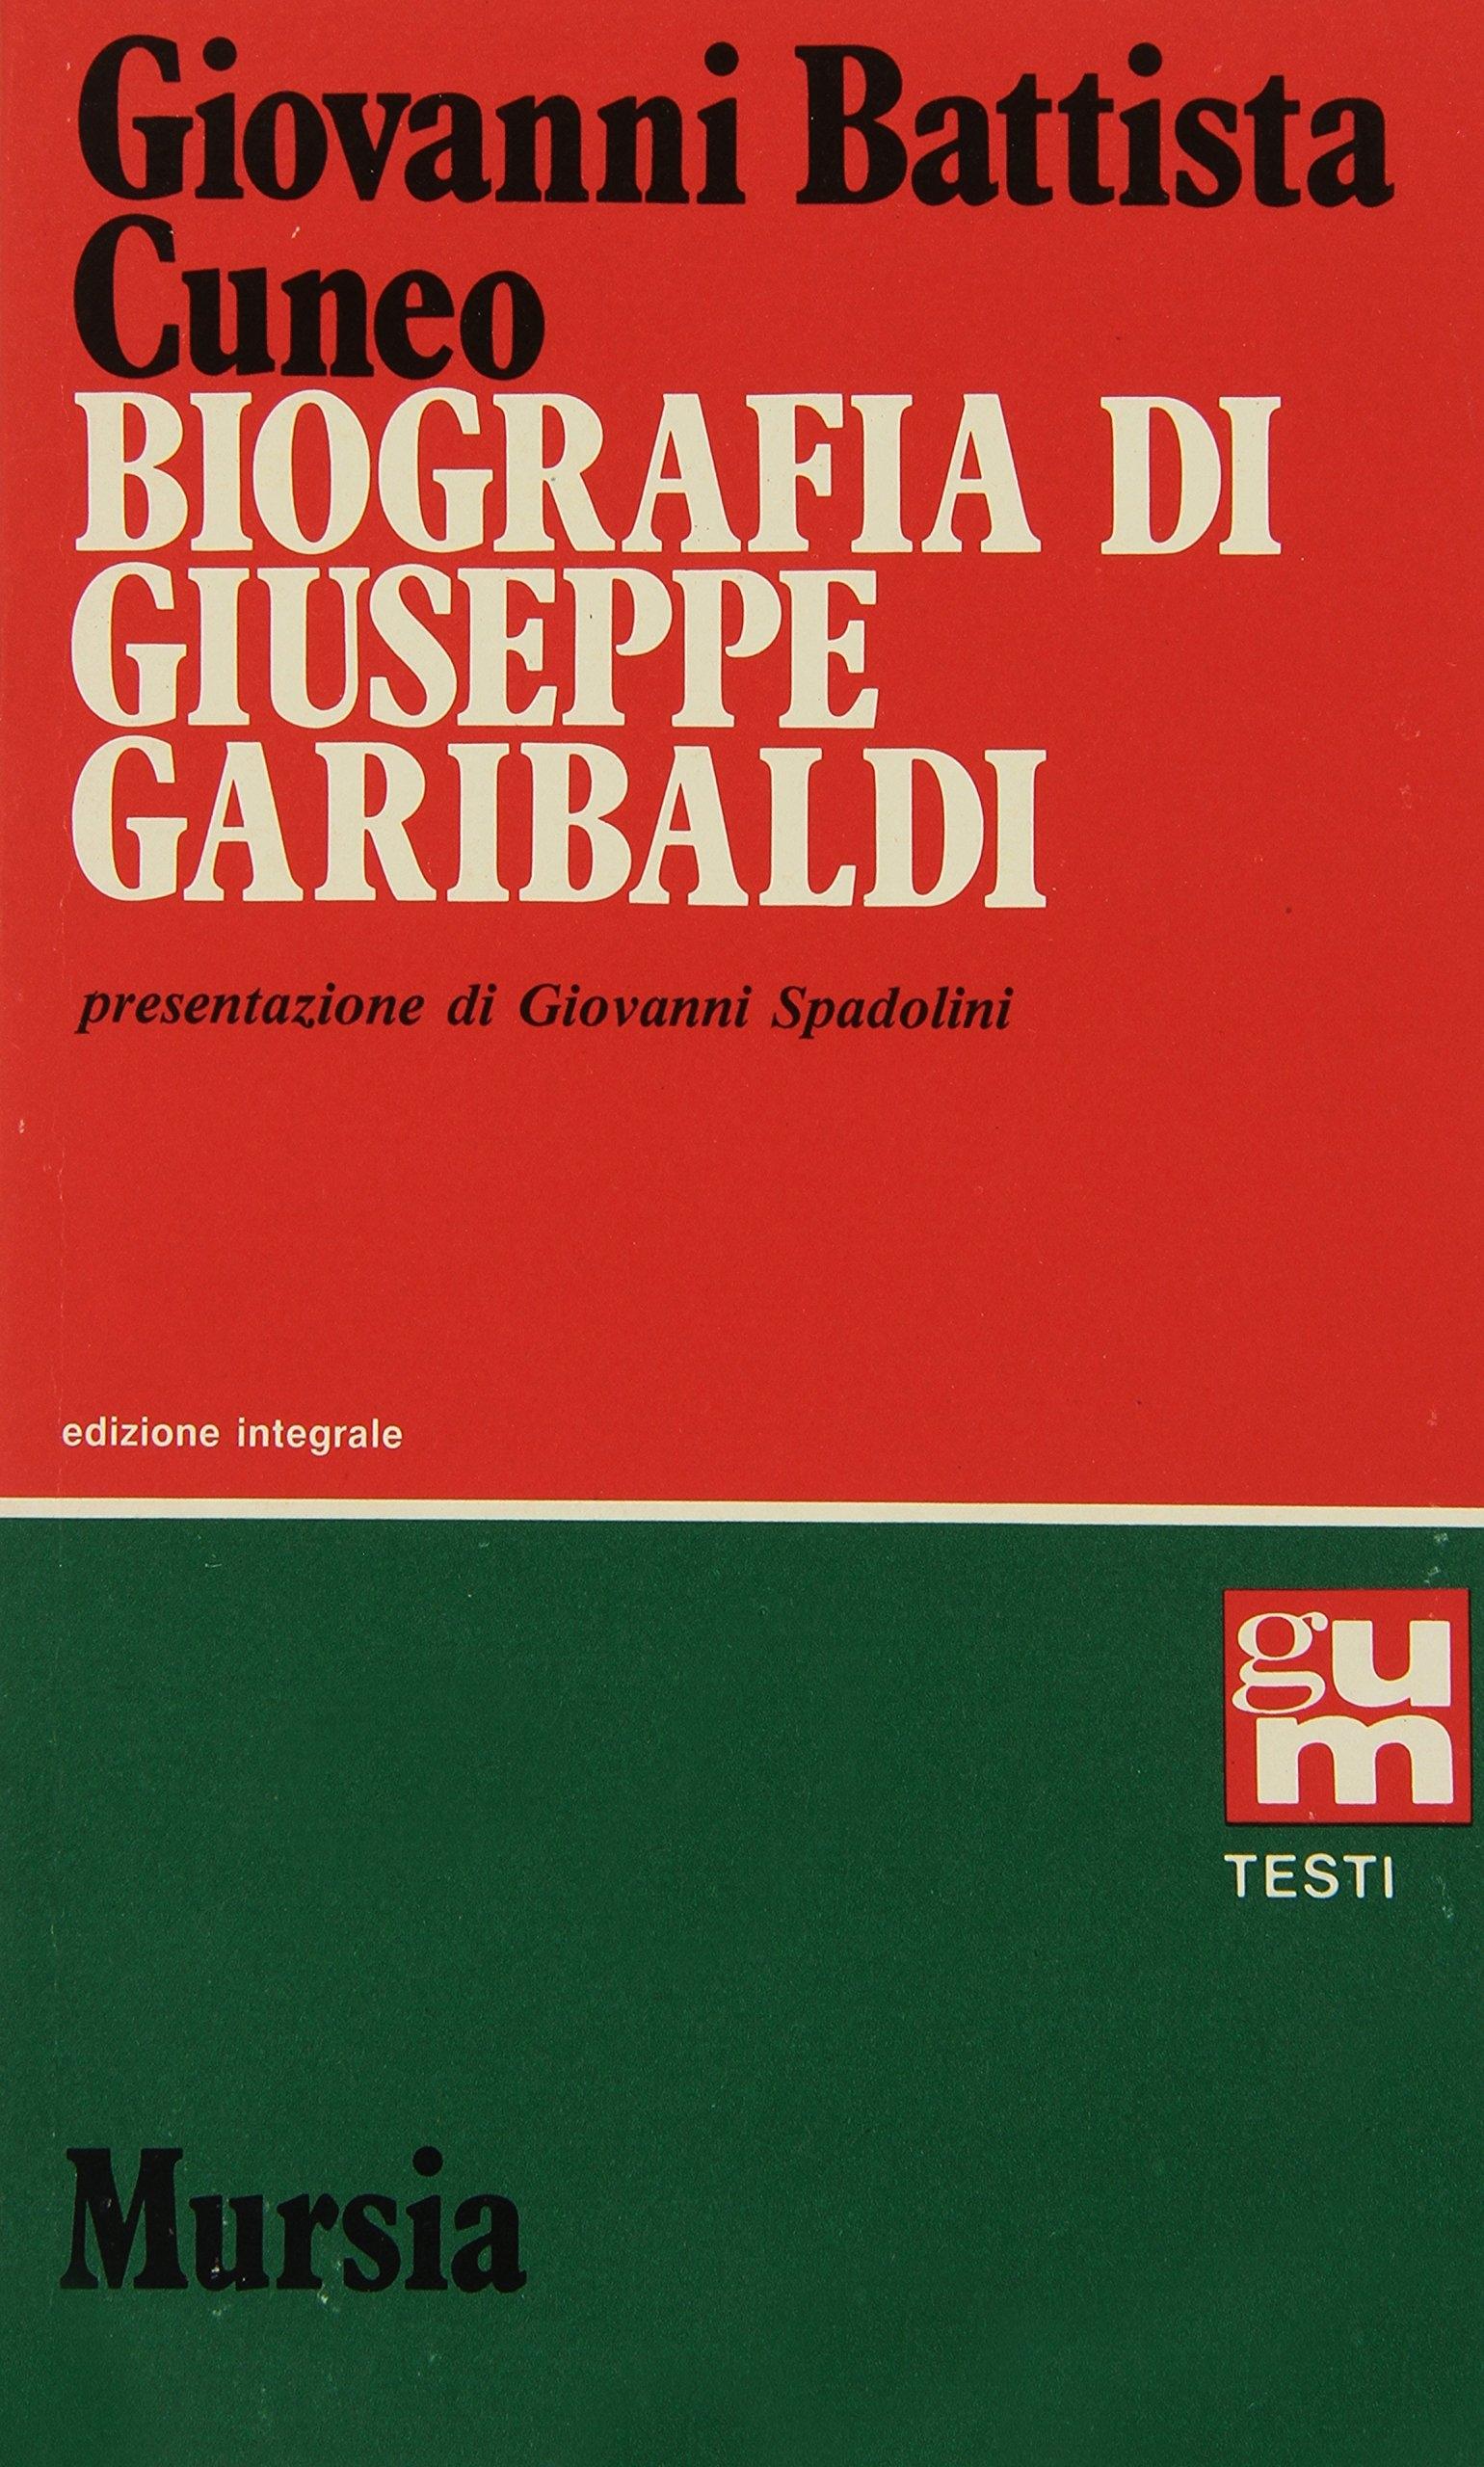 Biografia di Giuseppe Garibaldi.